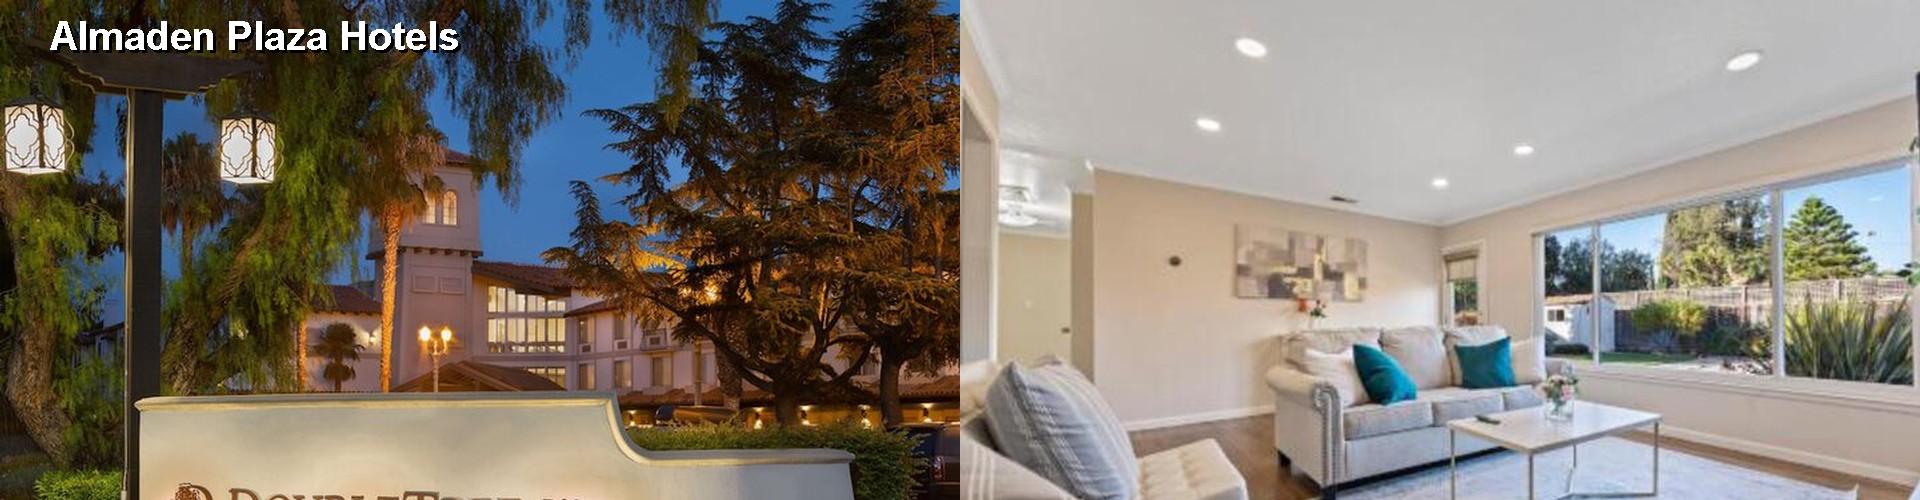 5 Best Hotels Near Almaden Plaza